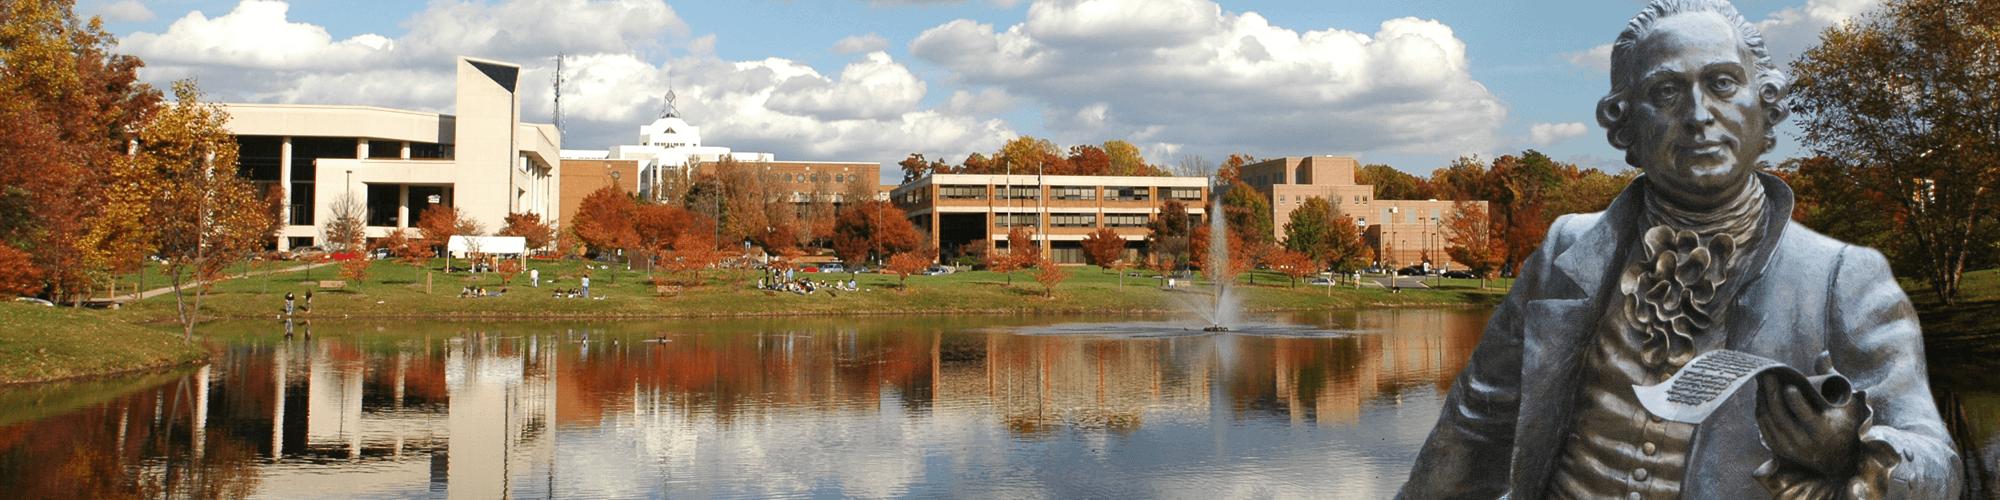 Georgemason 2000x500 bigpicture university  1